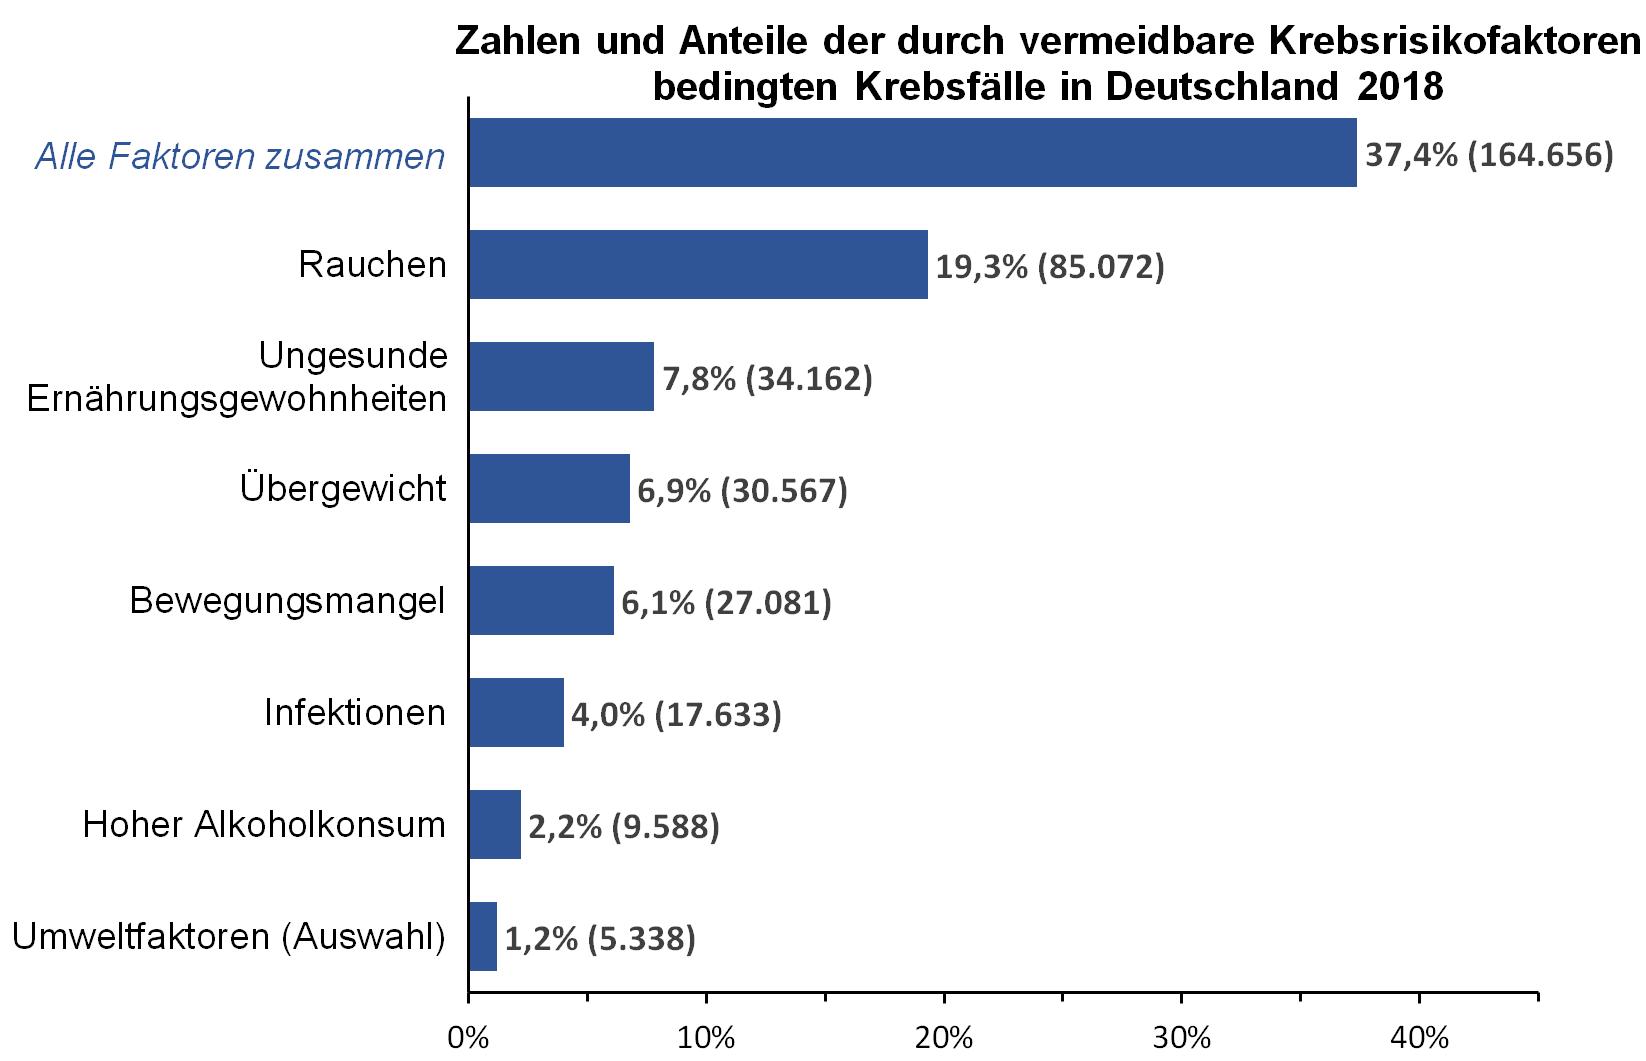 https://www.dkfz.de/de/presse/pressemitteilungen/2018/bilder/Attributable-Krebsfaelle-Alle-Faktoren.png